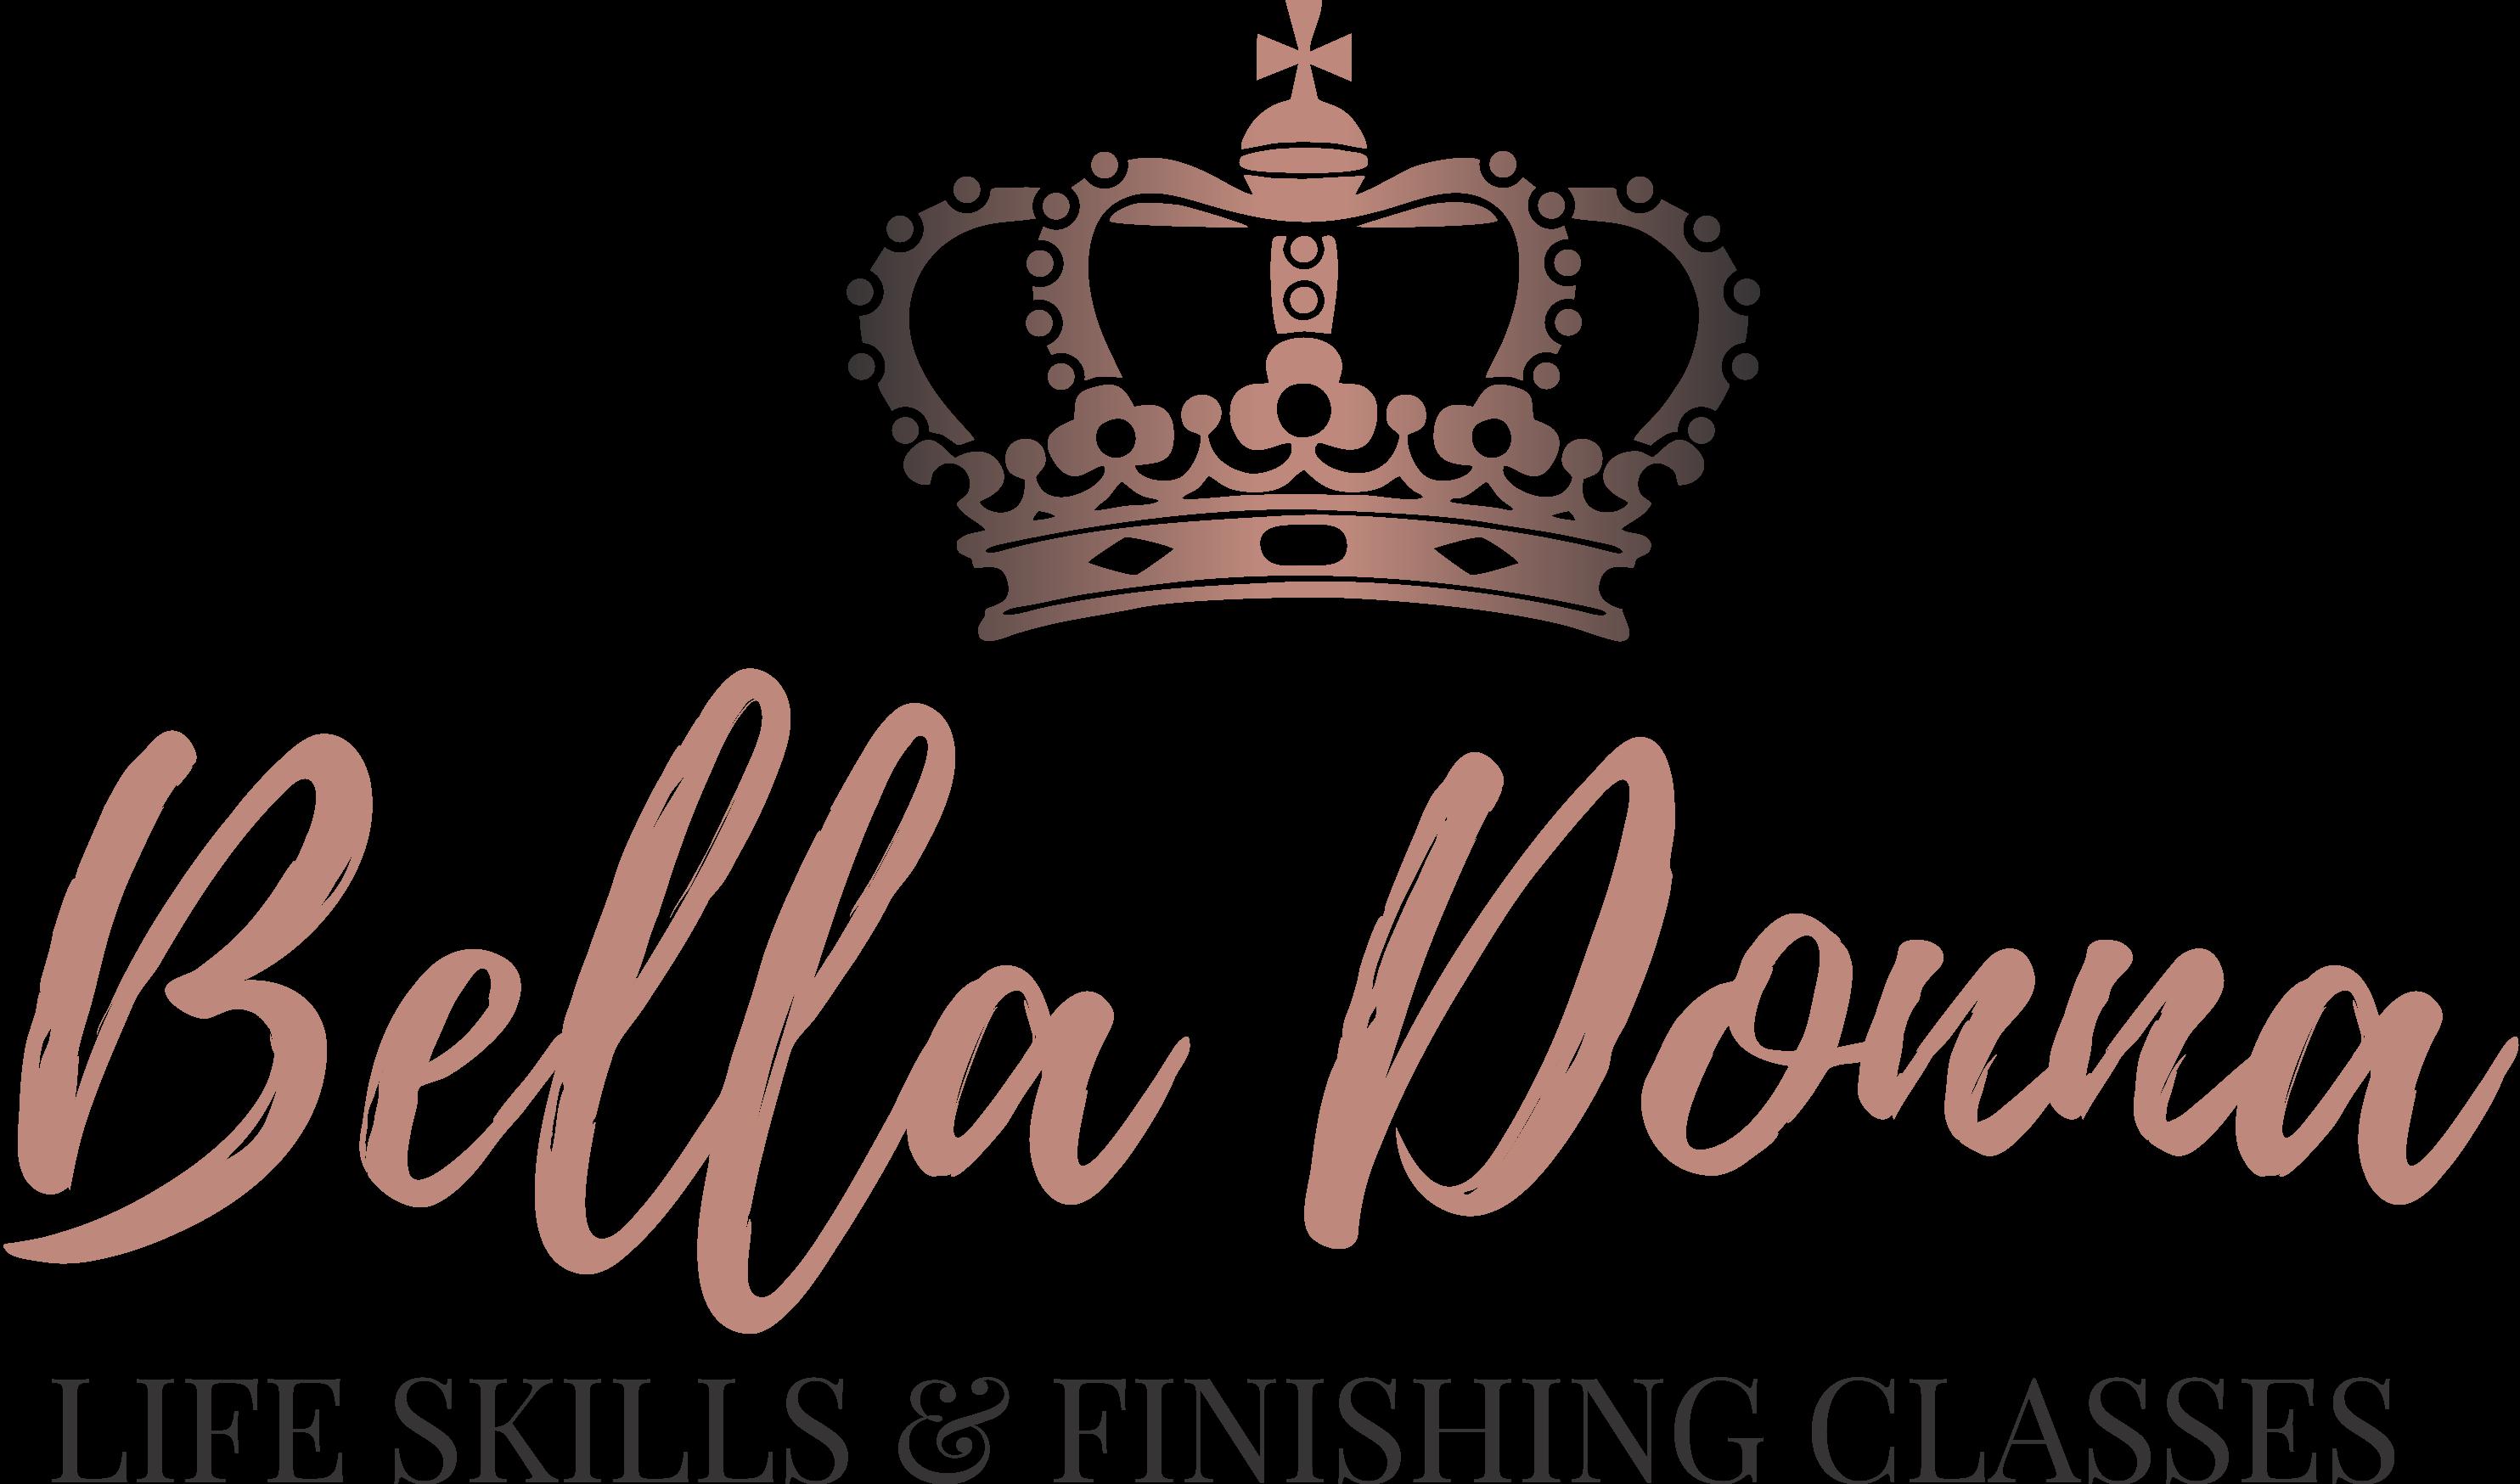 Bella Donna Life Skills & Finishing Classes